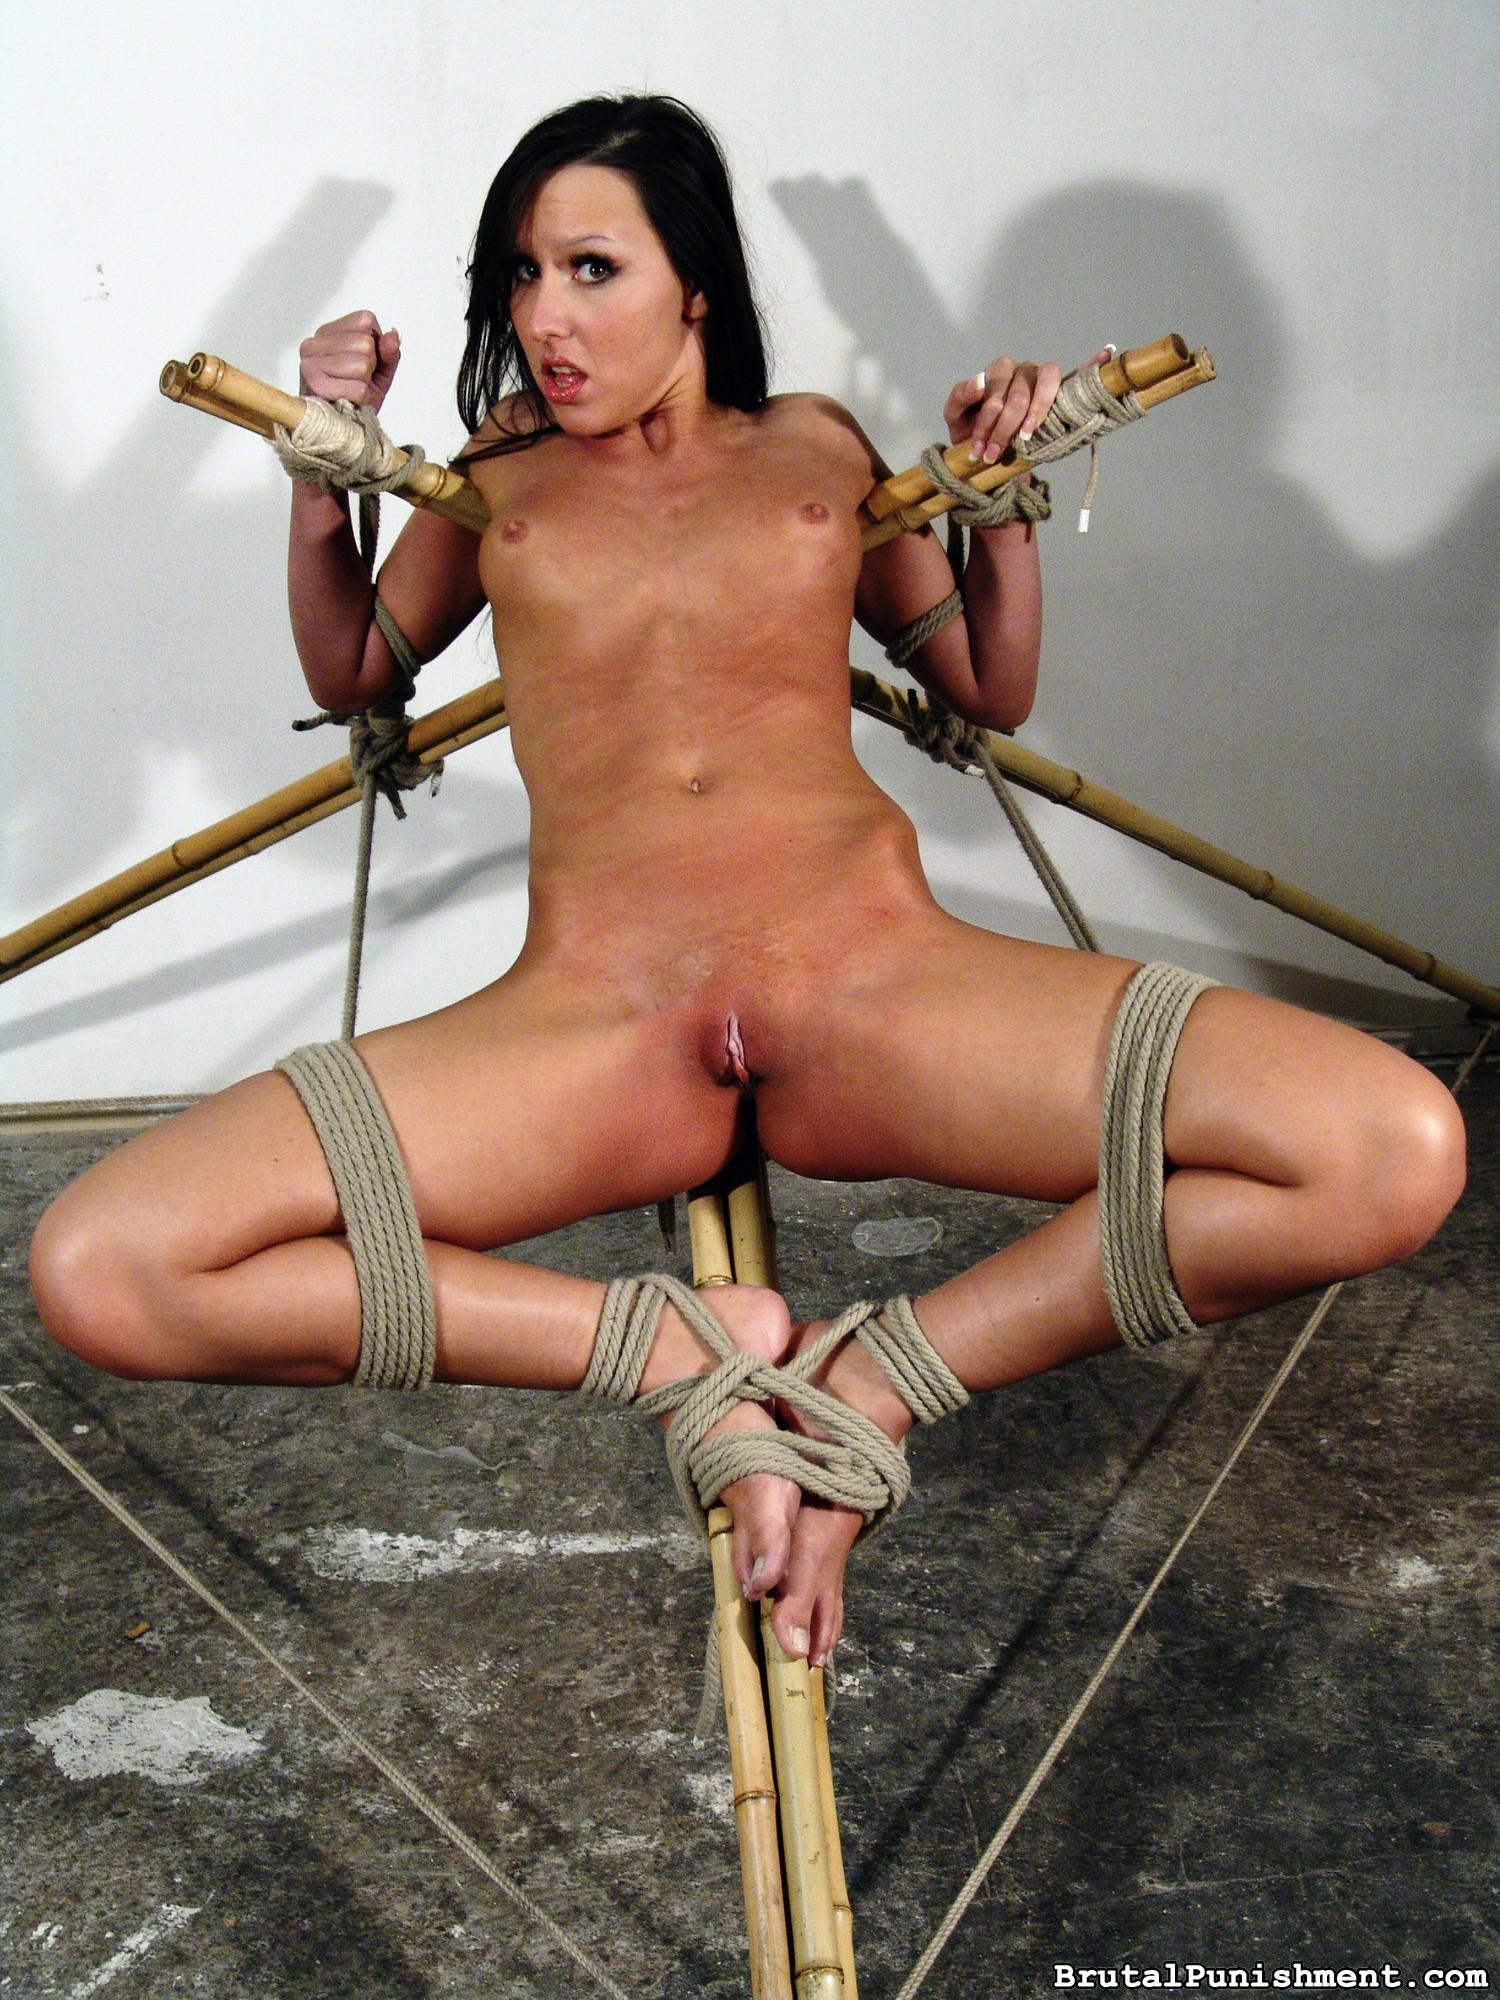 Ultra-kinky Anguish Fuckslut Nicole Suffers Every Other Restrain Bondage Consultation